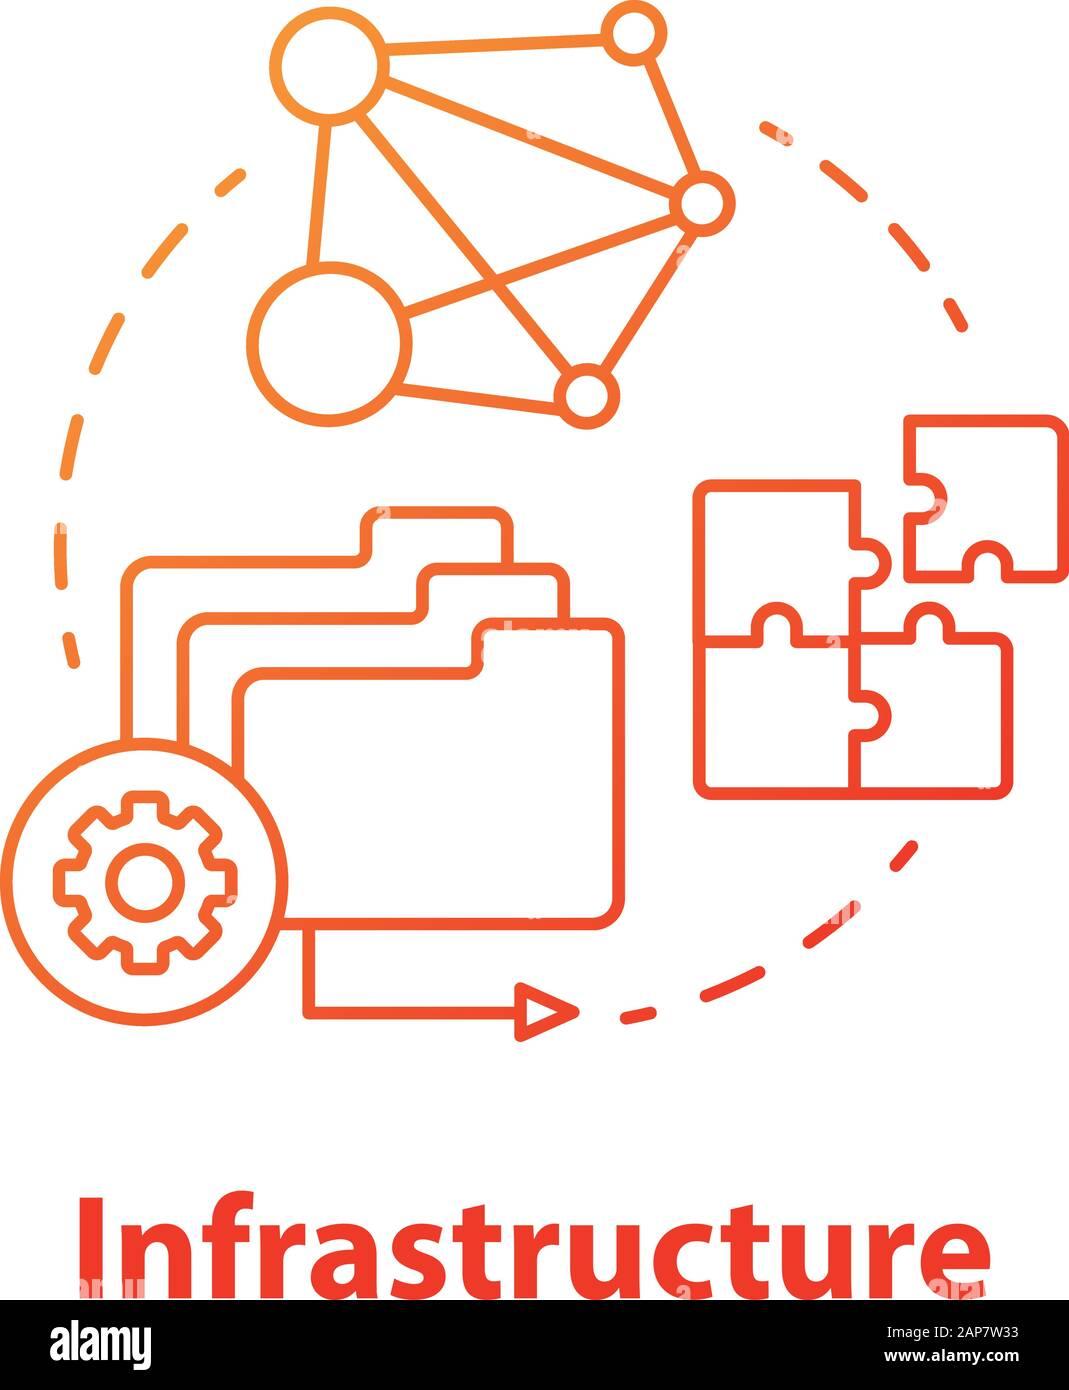 software development infrastructure diagram infrastructure concept icon software development tools idea thin  software development tools idea thin